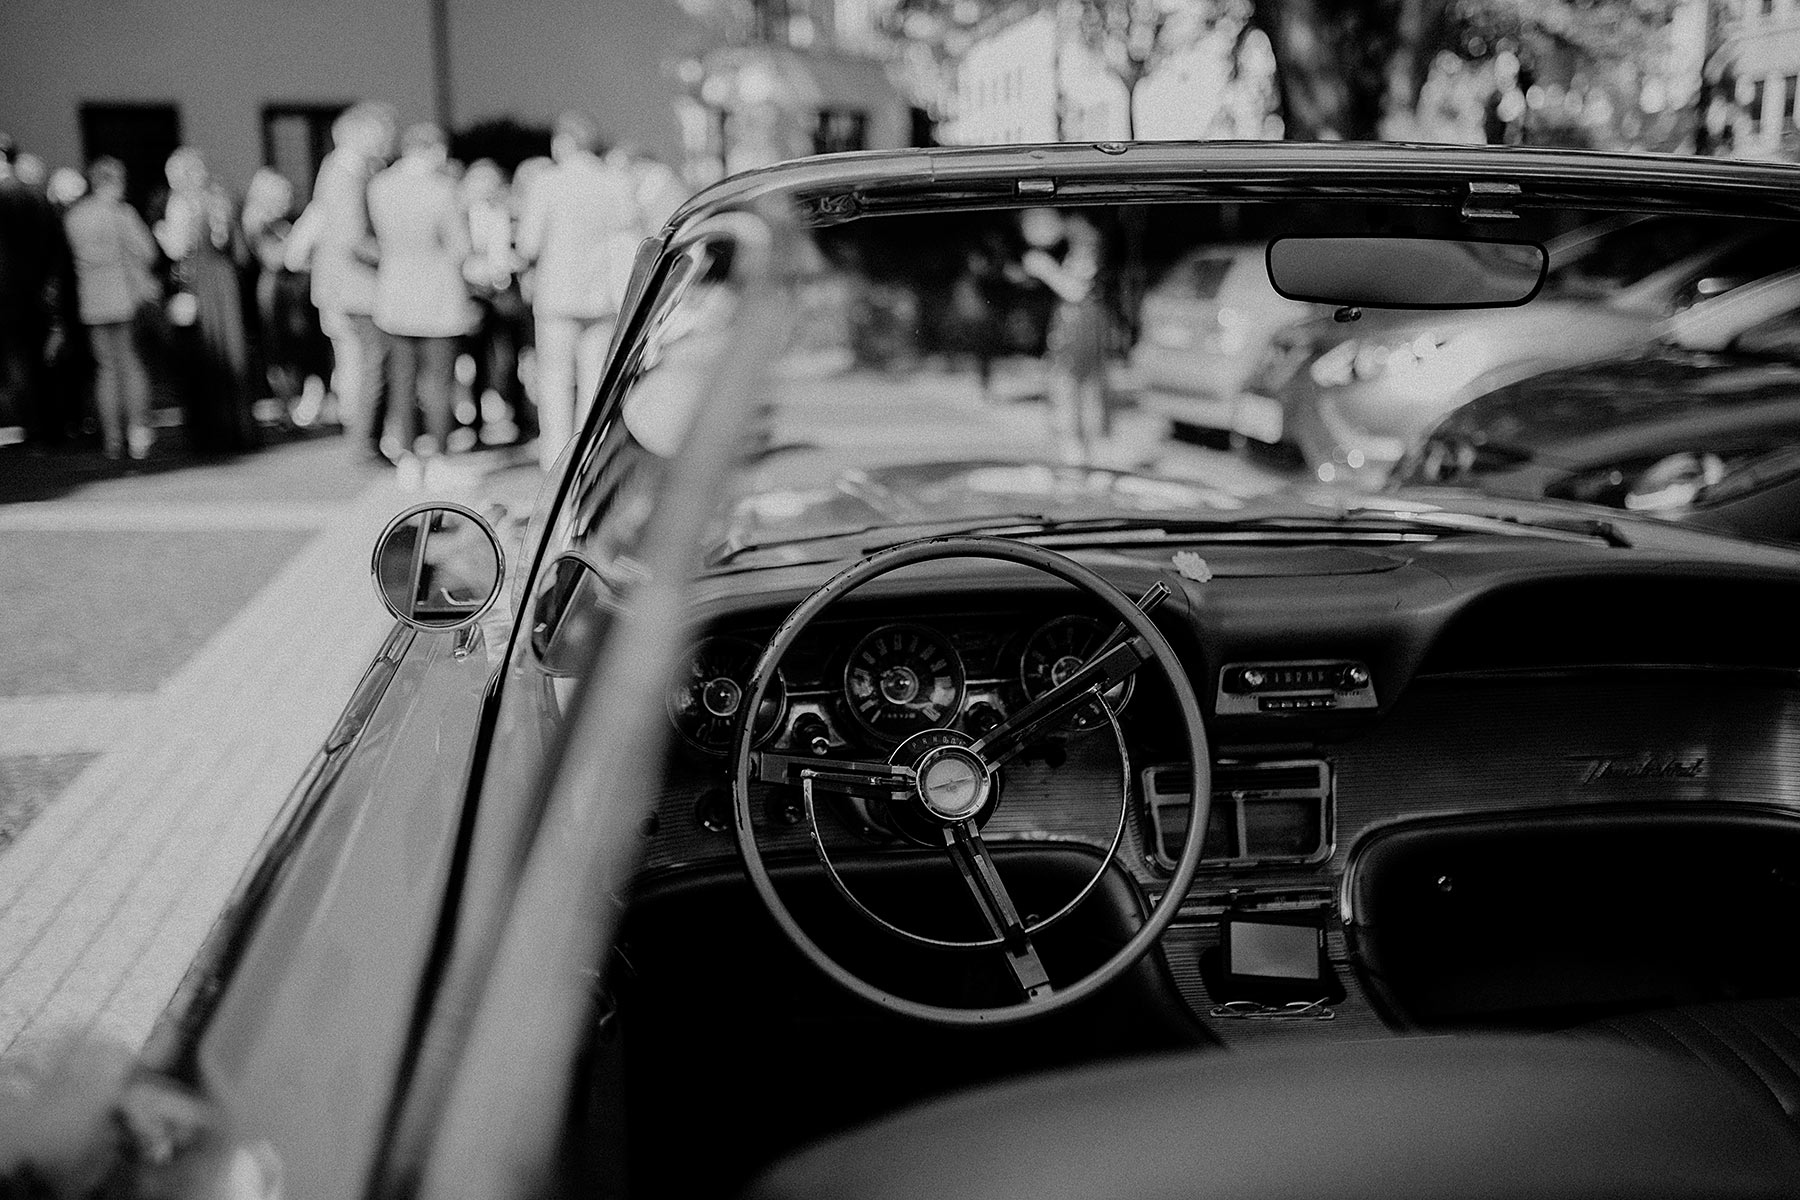 hochzeitsauto ford thunderbird cabrio oldtimer sunnyinga